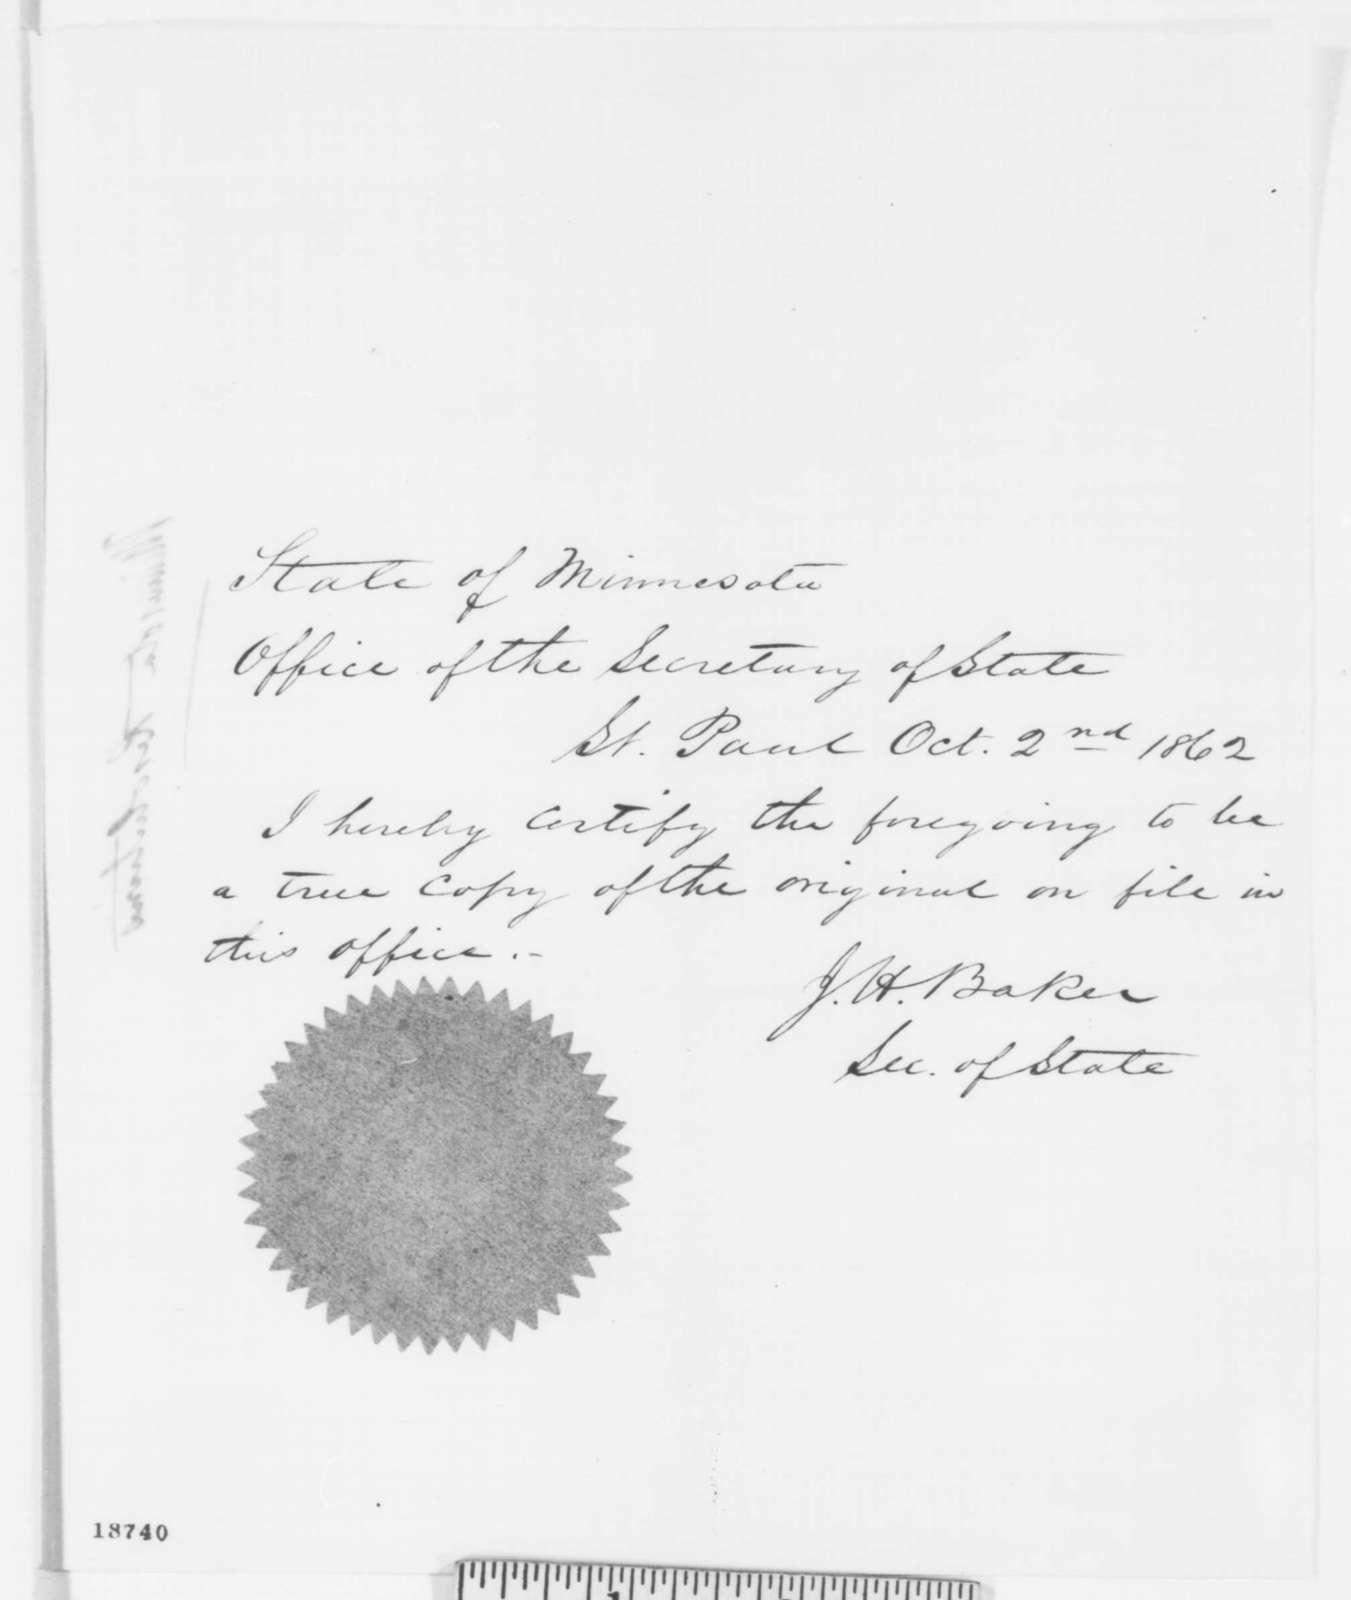 Minnesota Legislature, Monday, September 29, 1862  (Printed resolution)